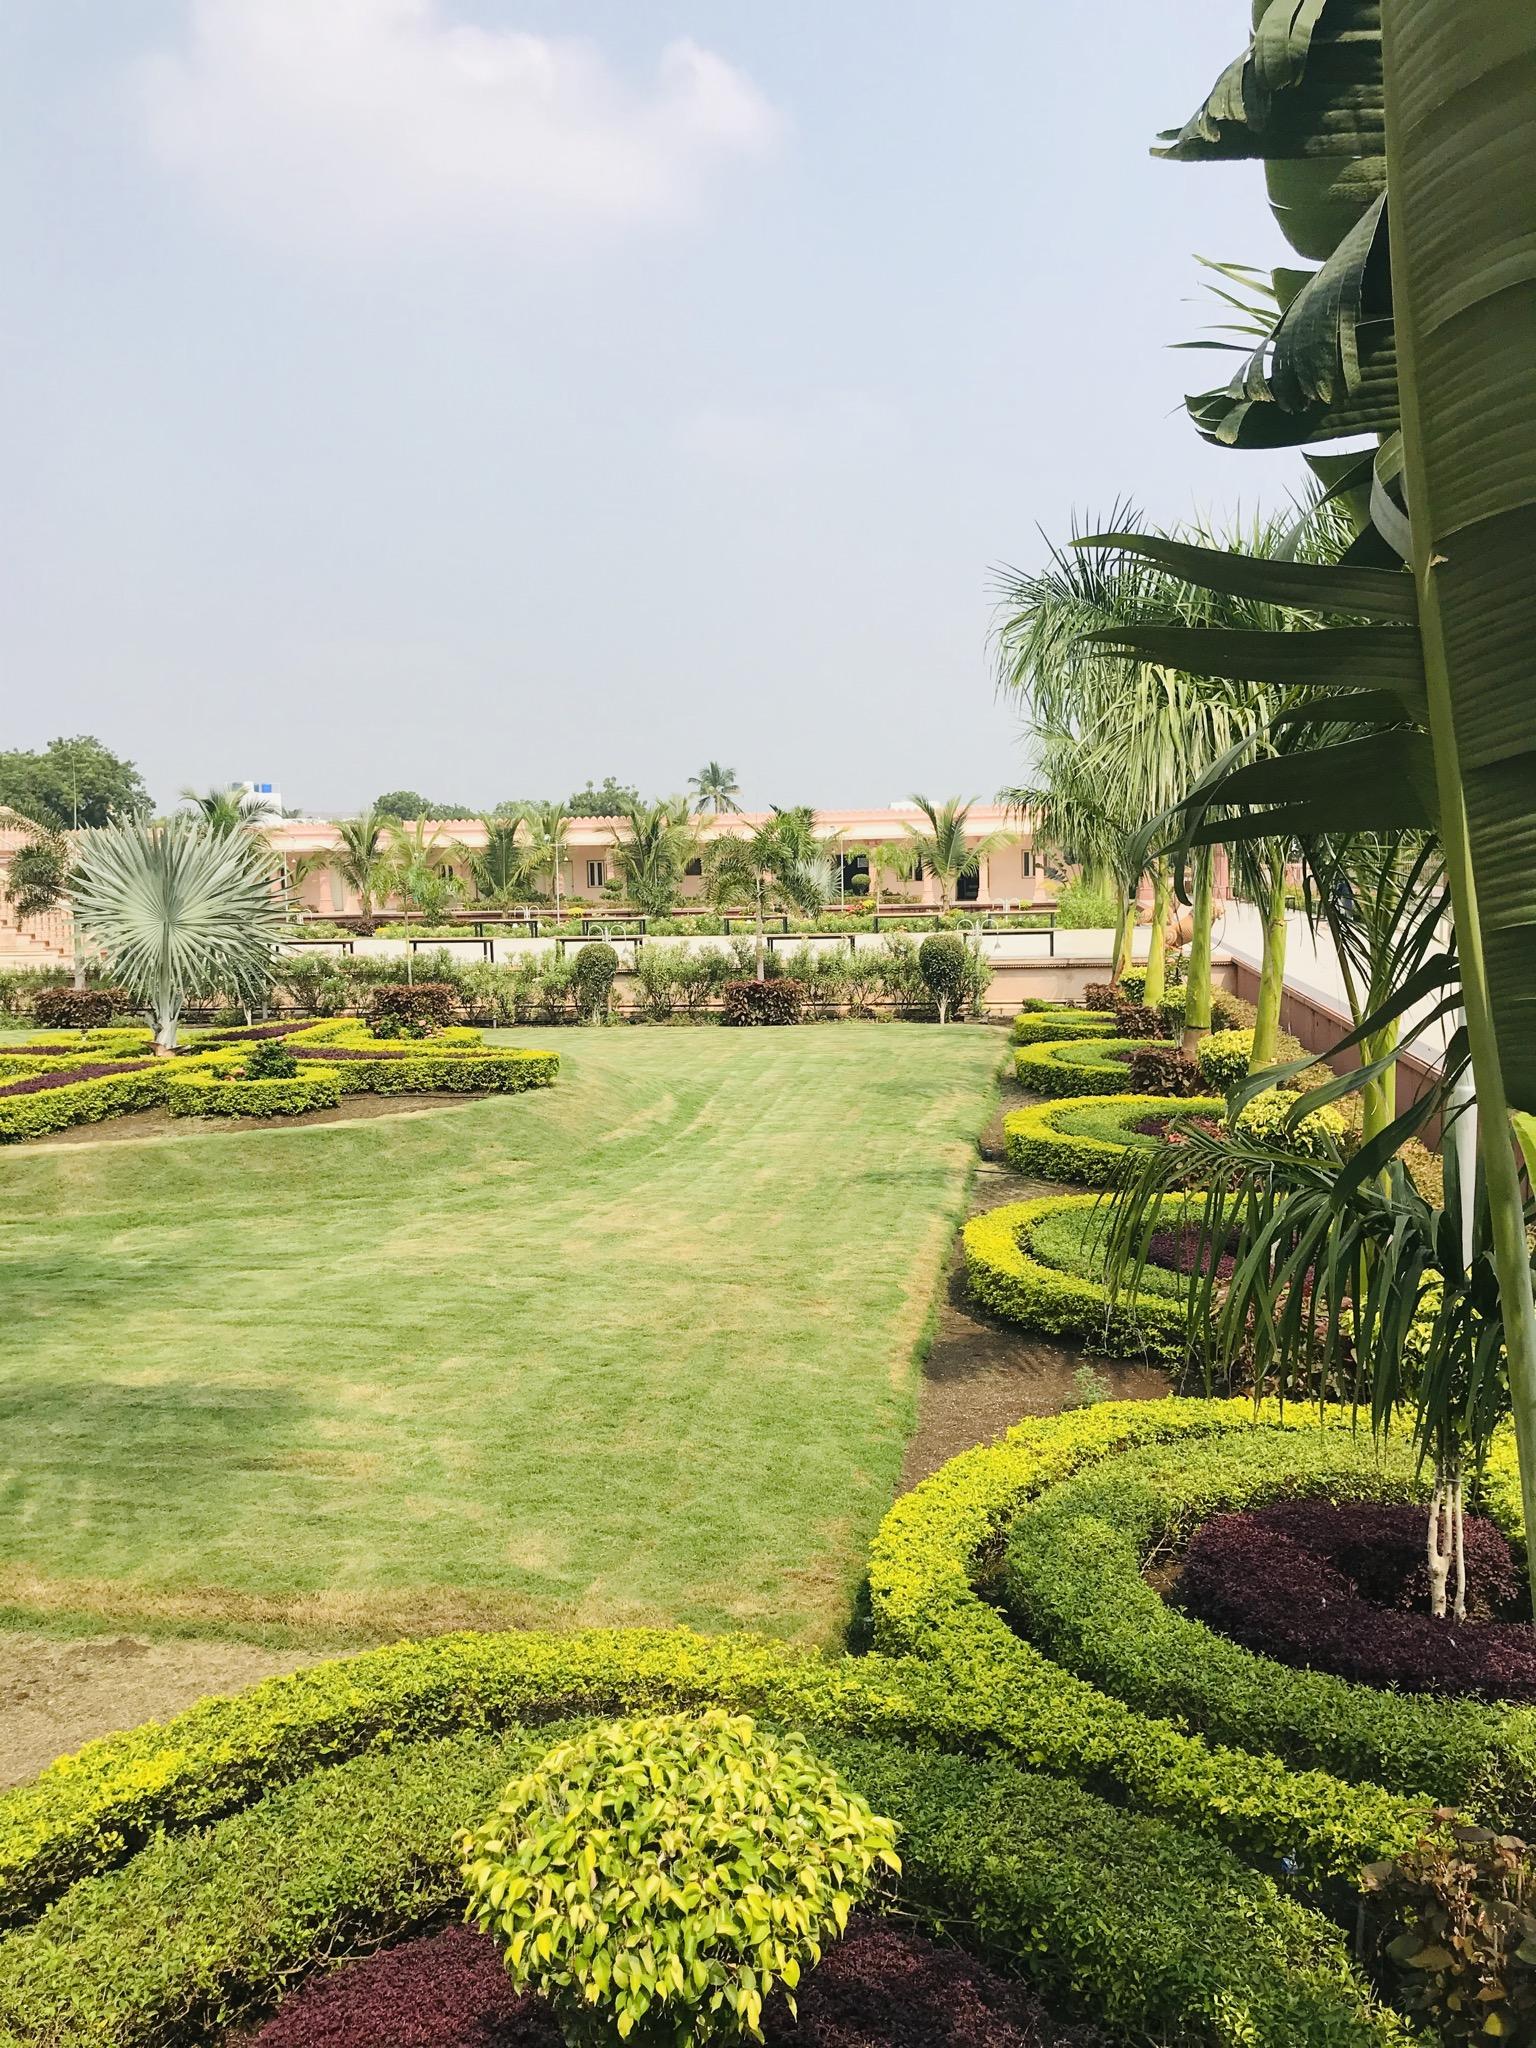 Greenery of a garden